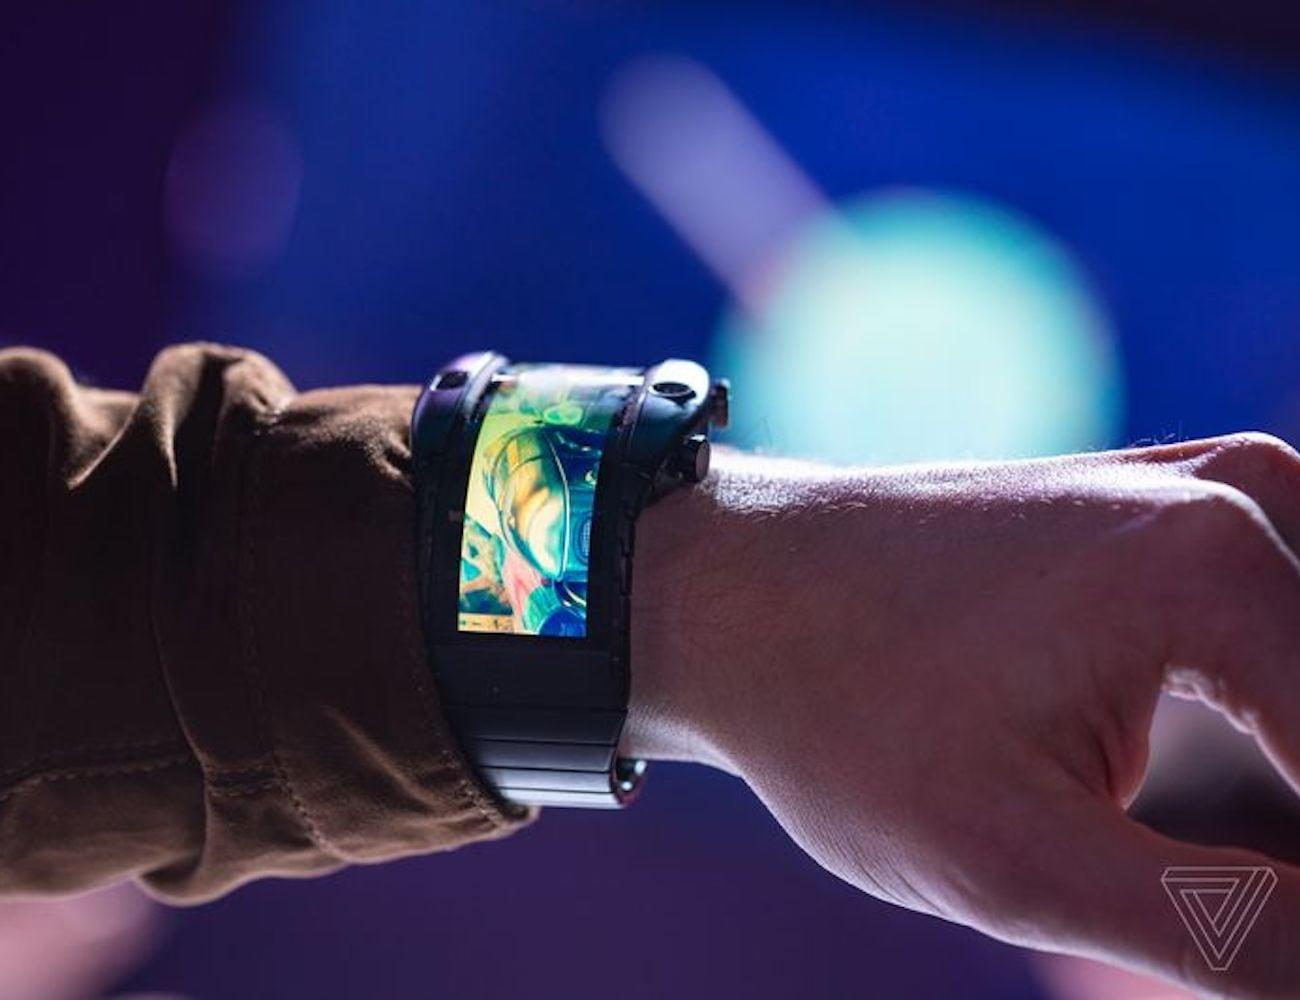 Nubia Alpha Wearable Foldable Smartphone wraps around your wrist